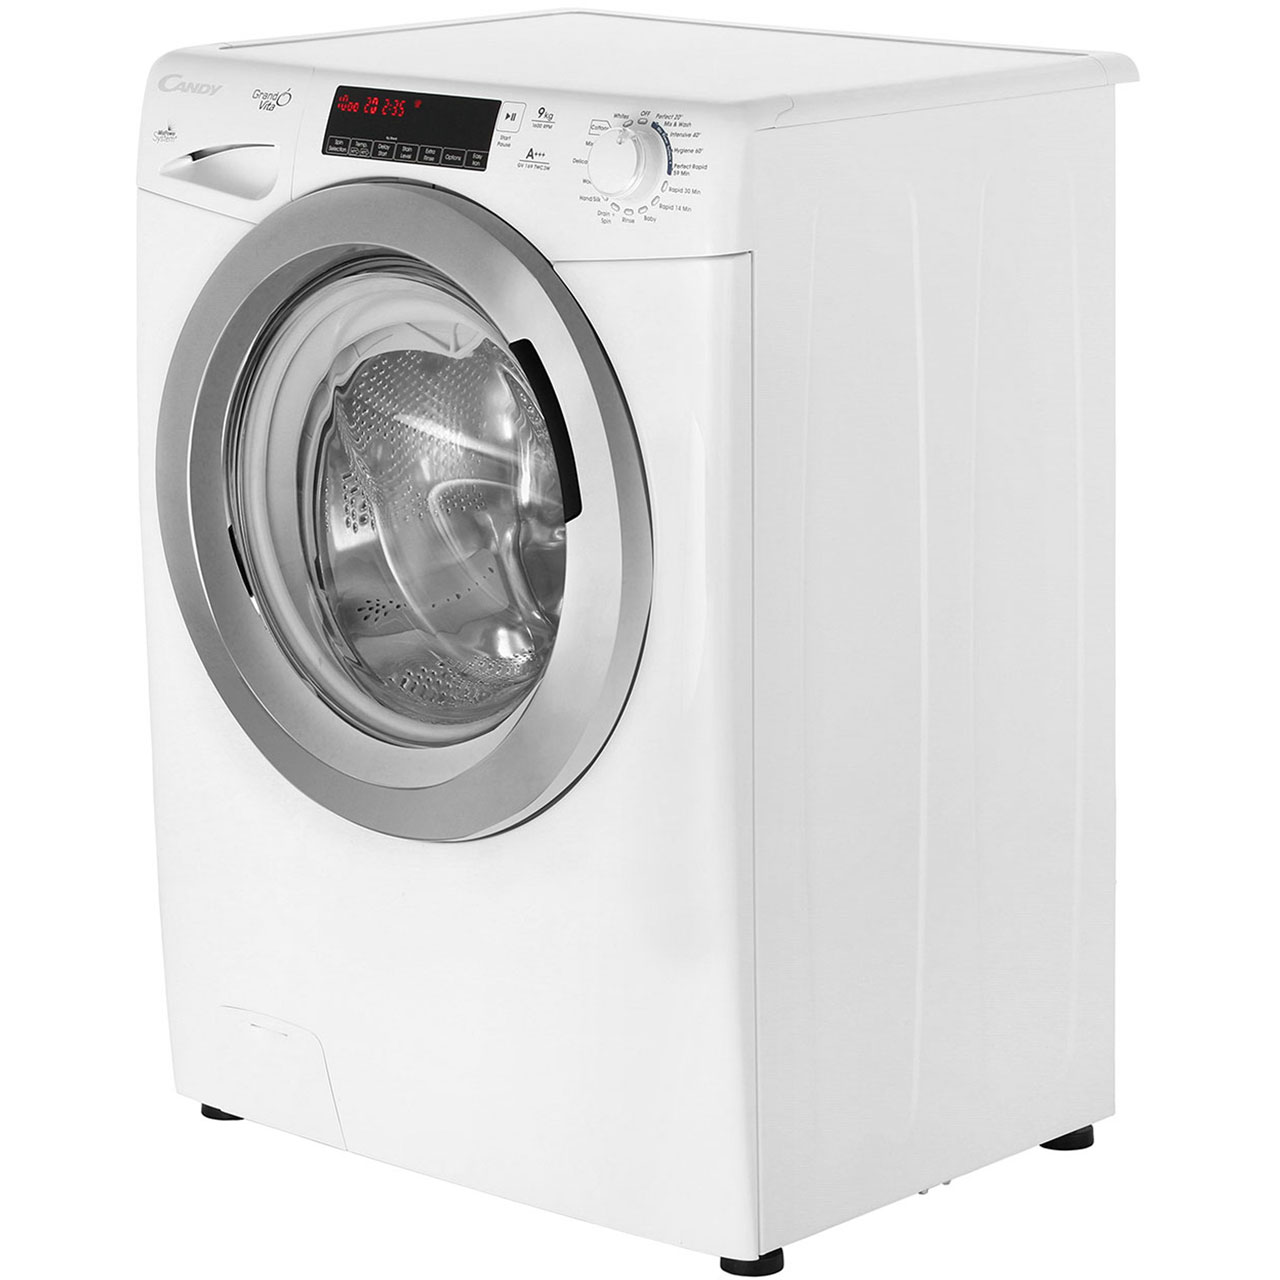 Standard Washing Machine Width Candy Grando Vita Gv169twc3w 9kg Washing Machine With 1600 Rpm